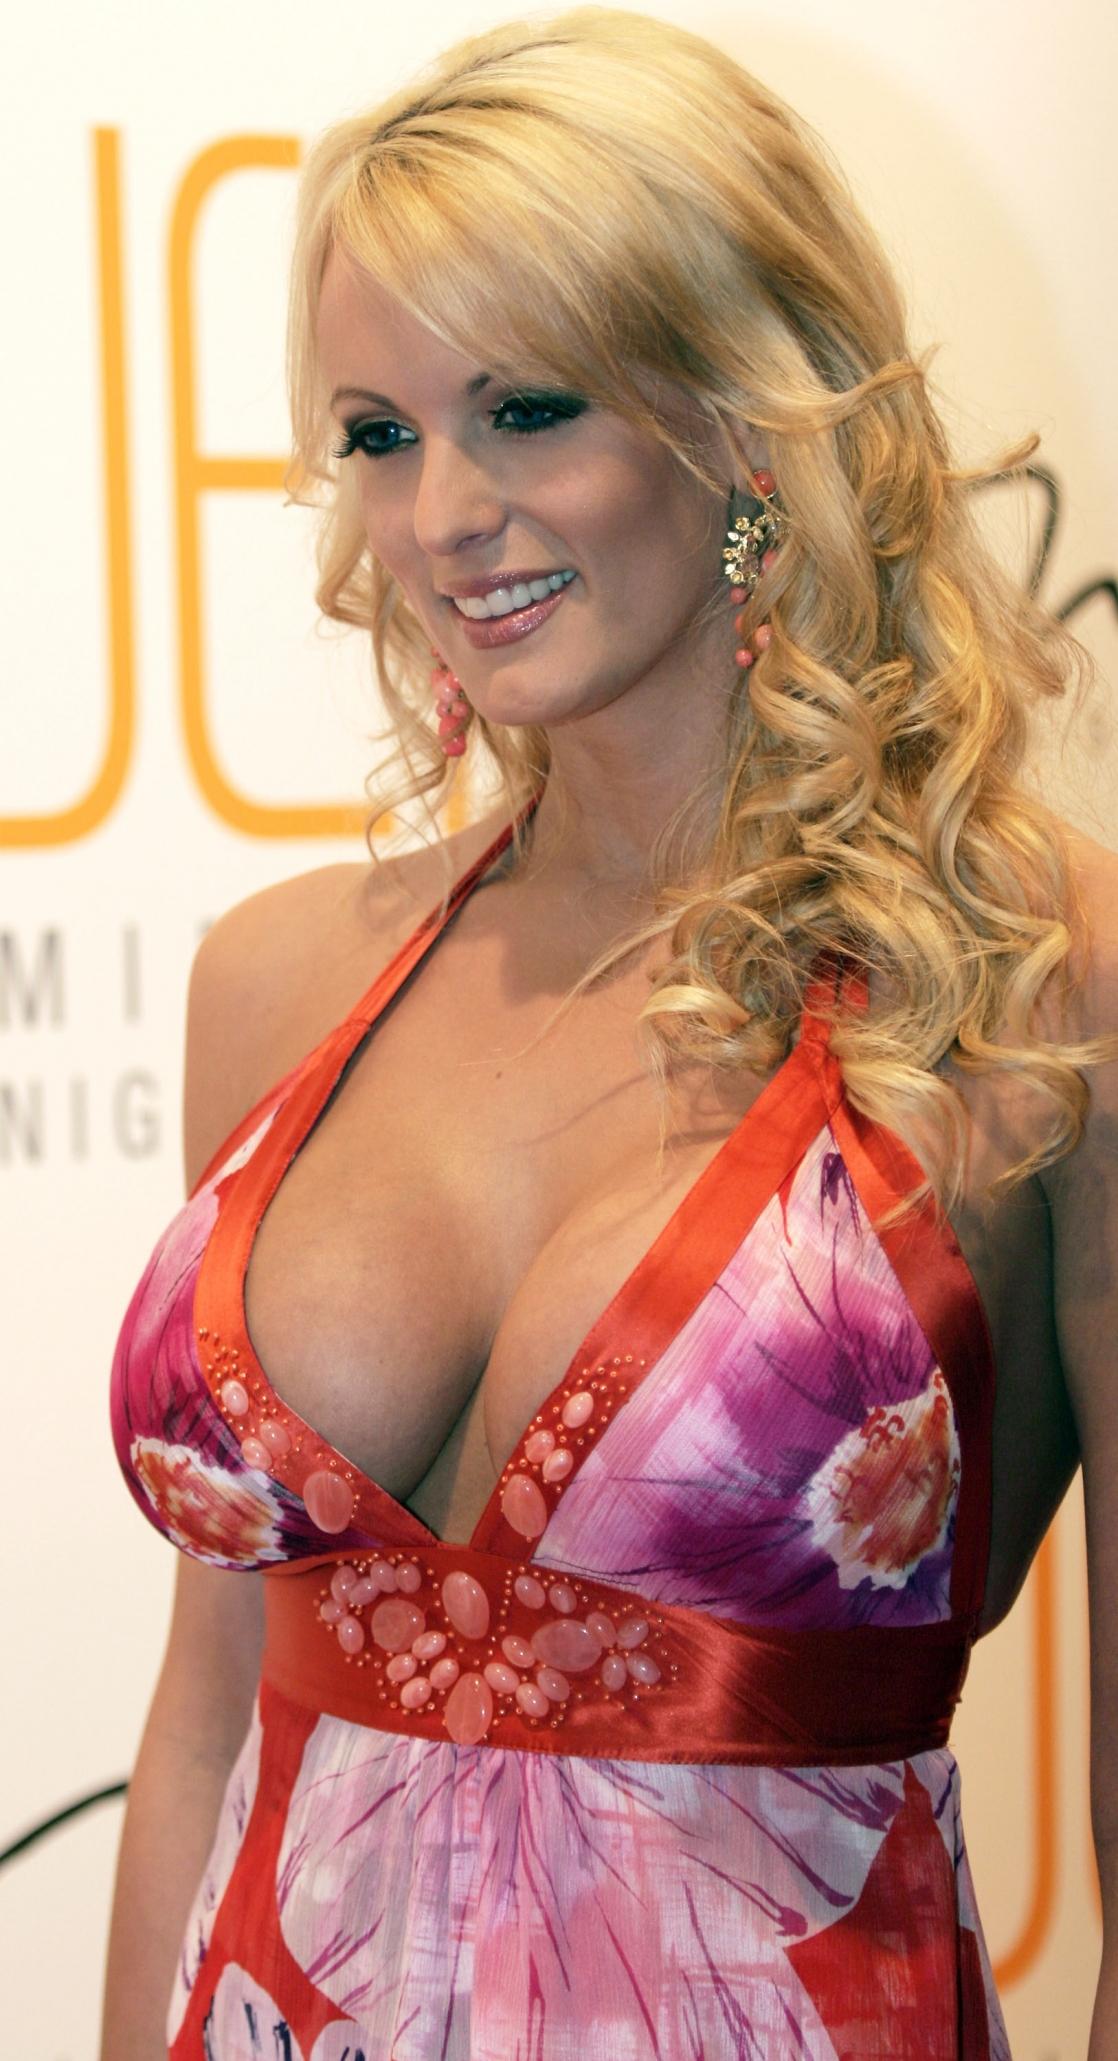 Big-tit blonde Stormy Daniels is getting load of sperm on her face № 96947 загрузить